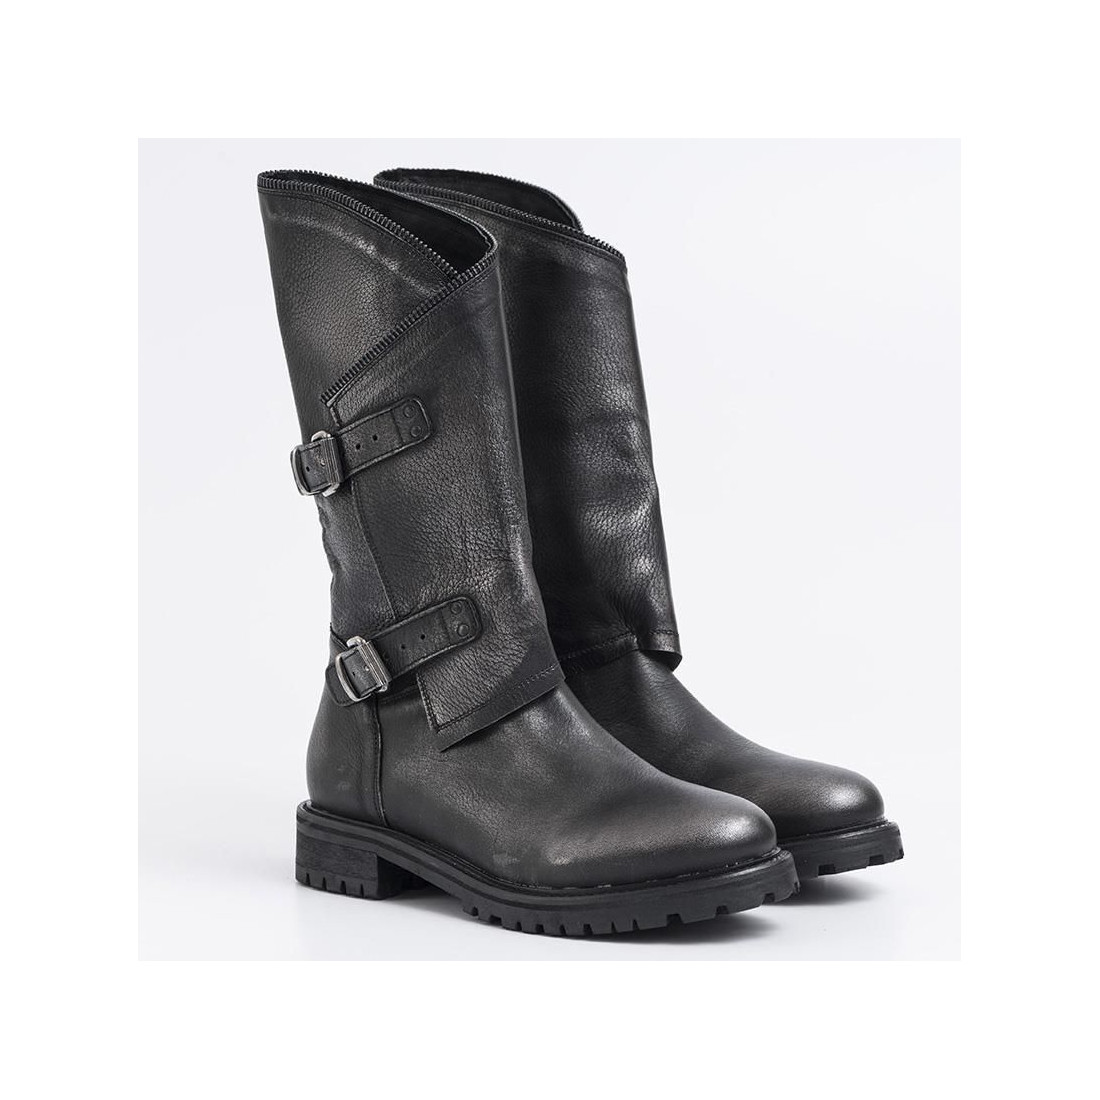 boots woman keb 120perl cdf 2308